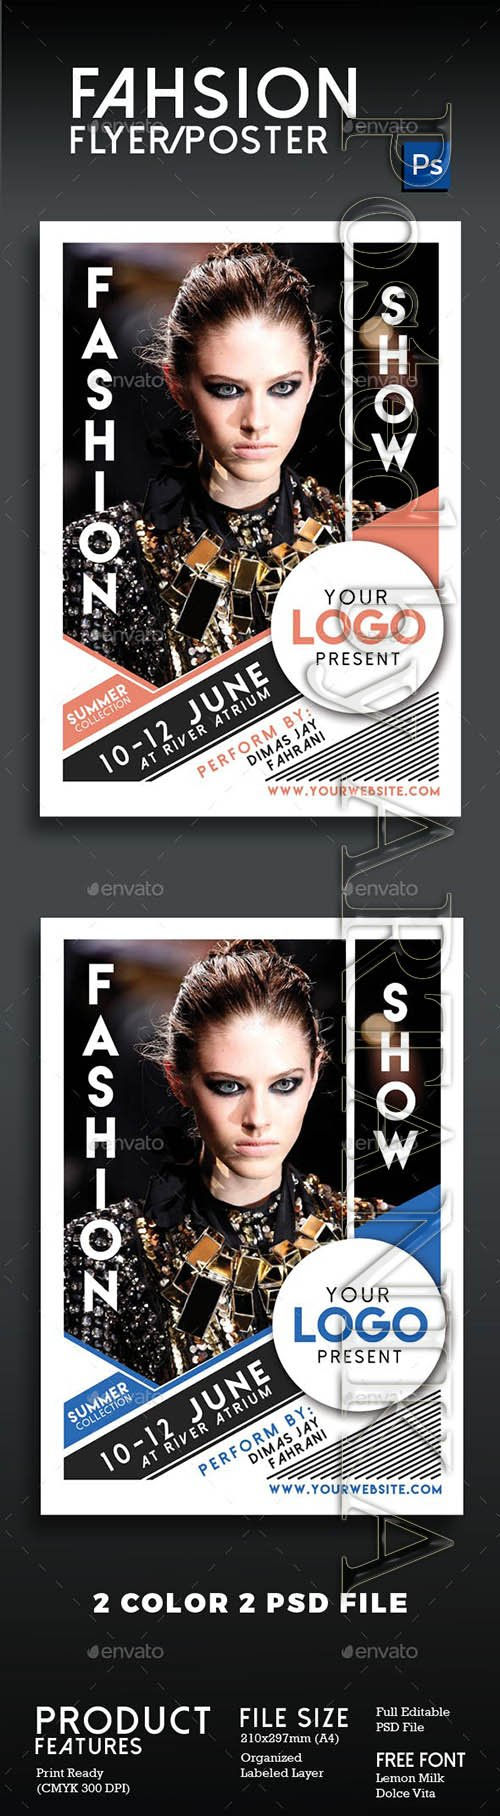 Graphicriver - Fashion Show Flyer Poster Vol 2 16292512